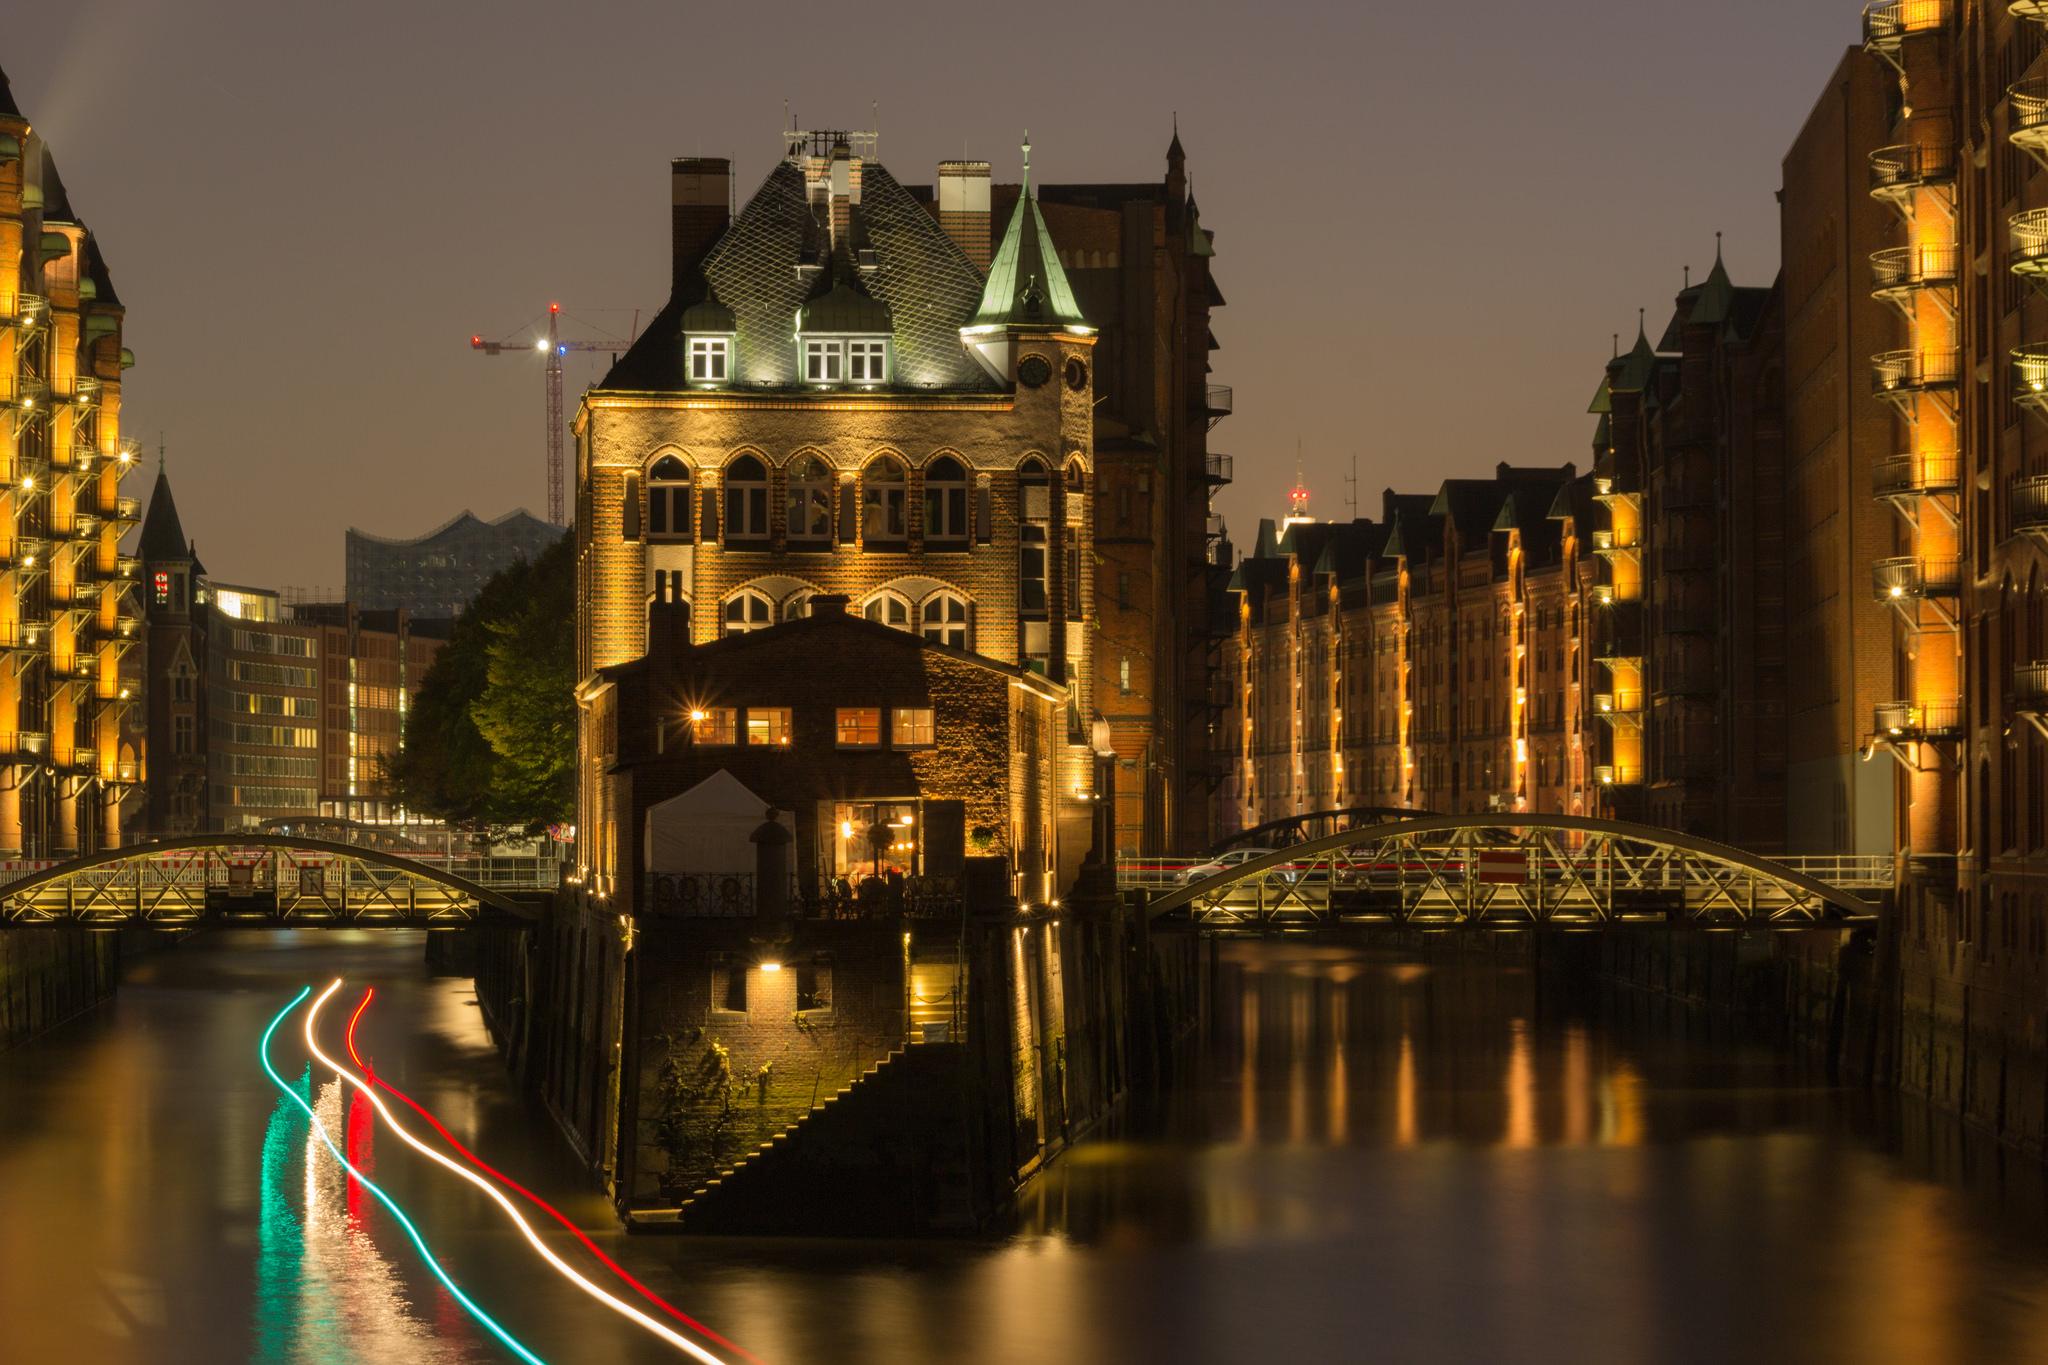 Das Wasserschloss, Hamburg, Germany